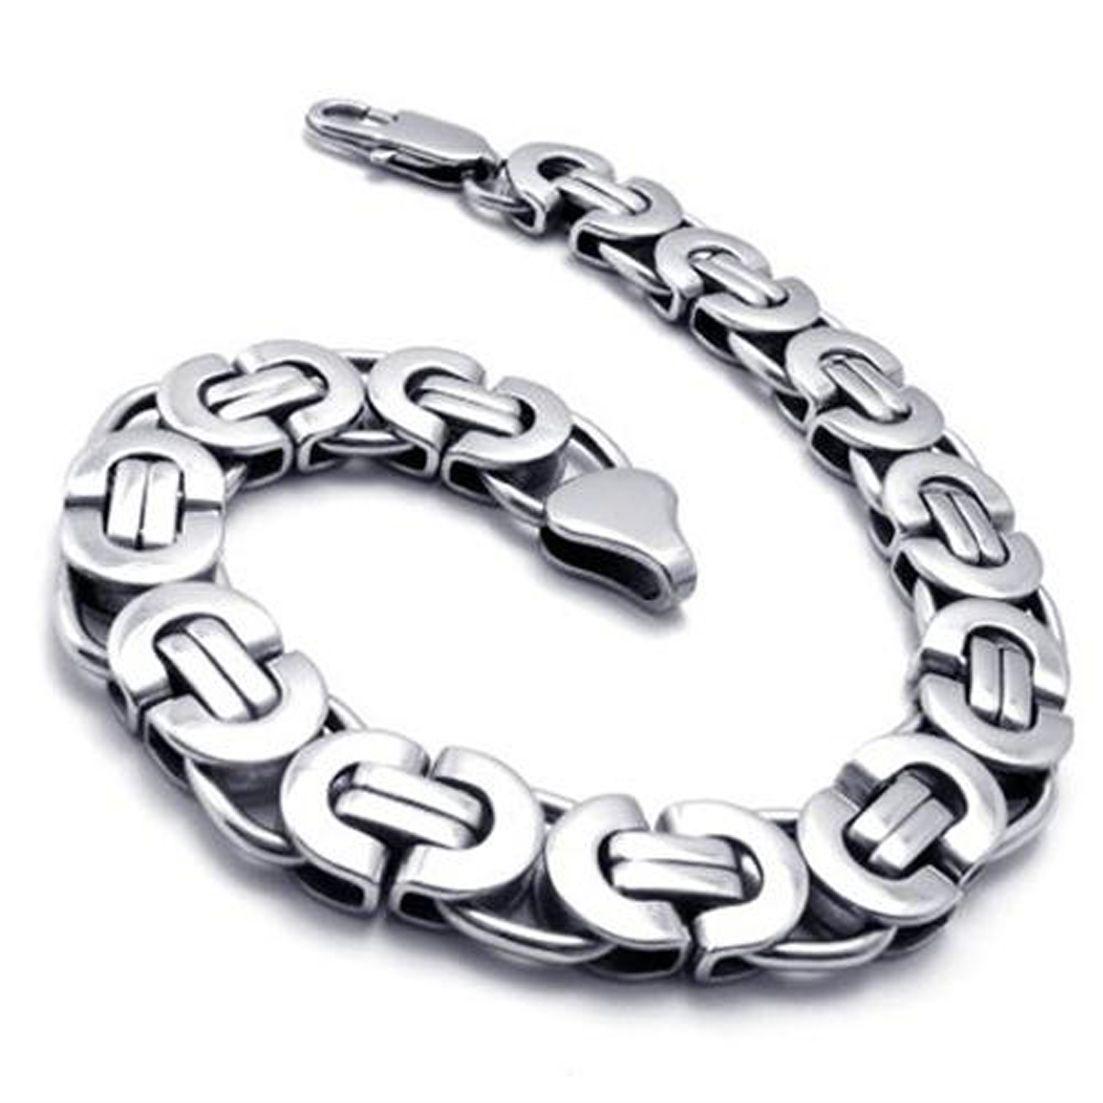 Chandi bracelet design for boy